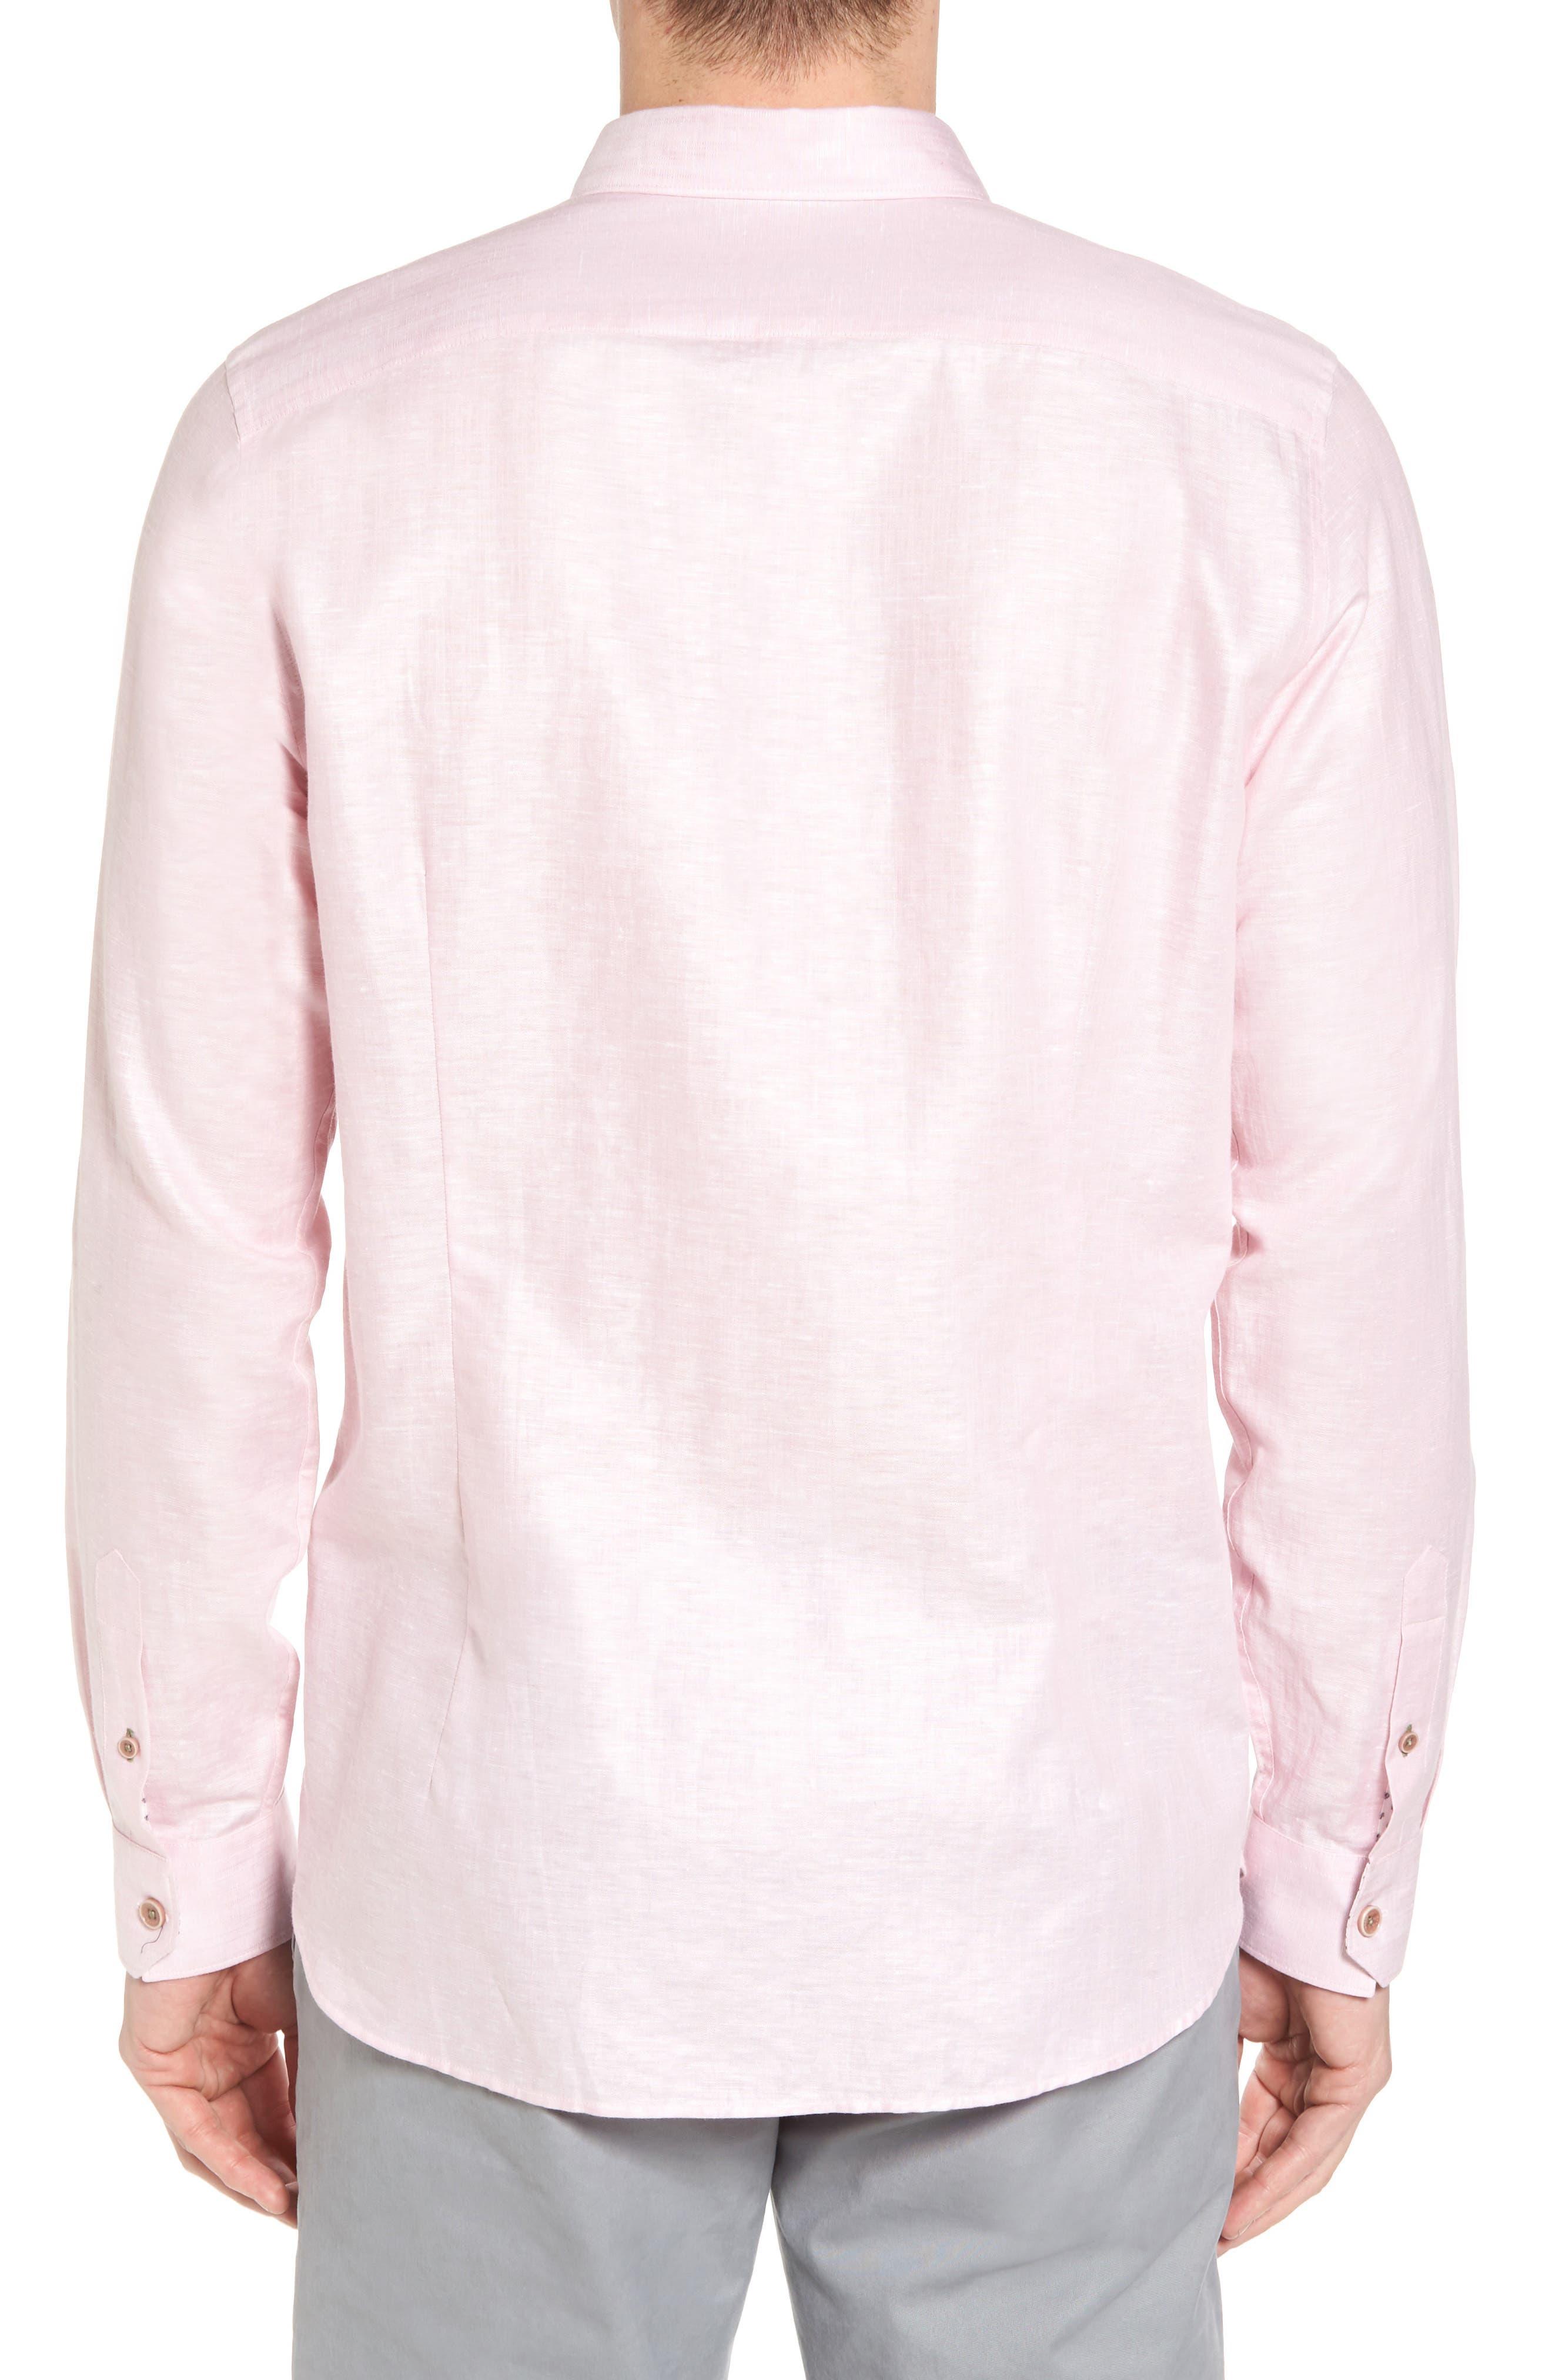 Linlins Herringbone Cotton & Linen Sport Shirt,                             Alternate thumbnail 10, color,